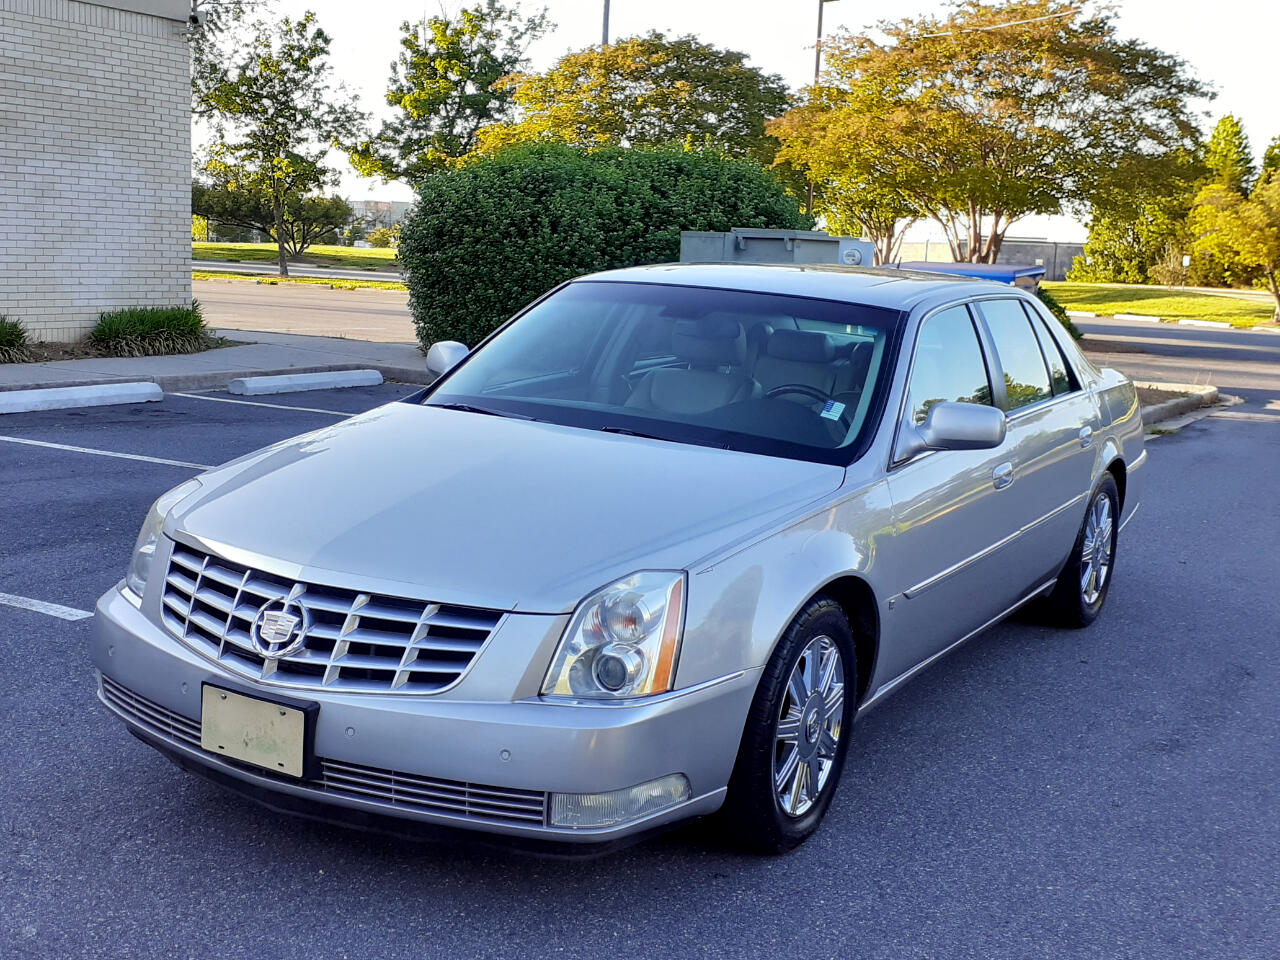 Cadillac DTS 4dr Sdn Luxury II 2007